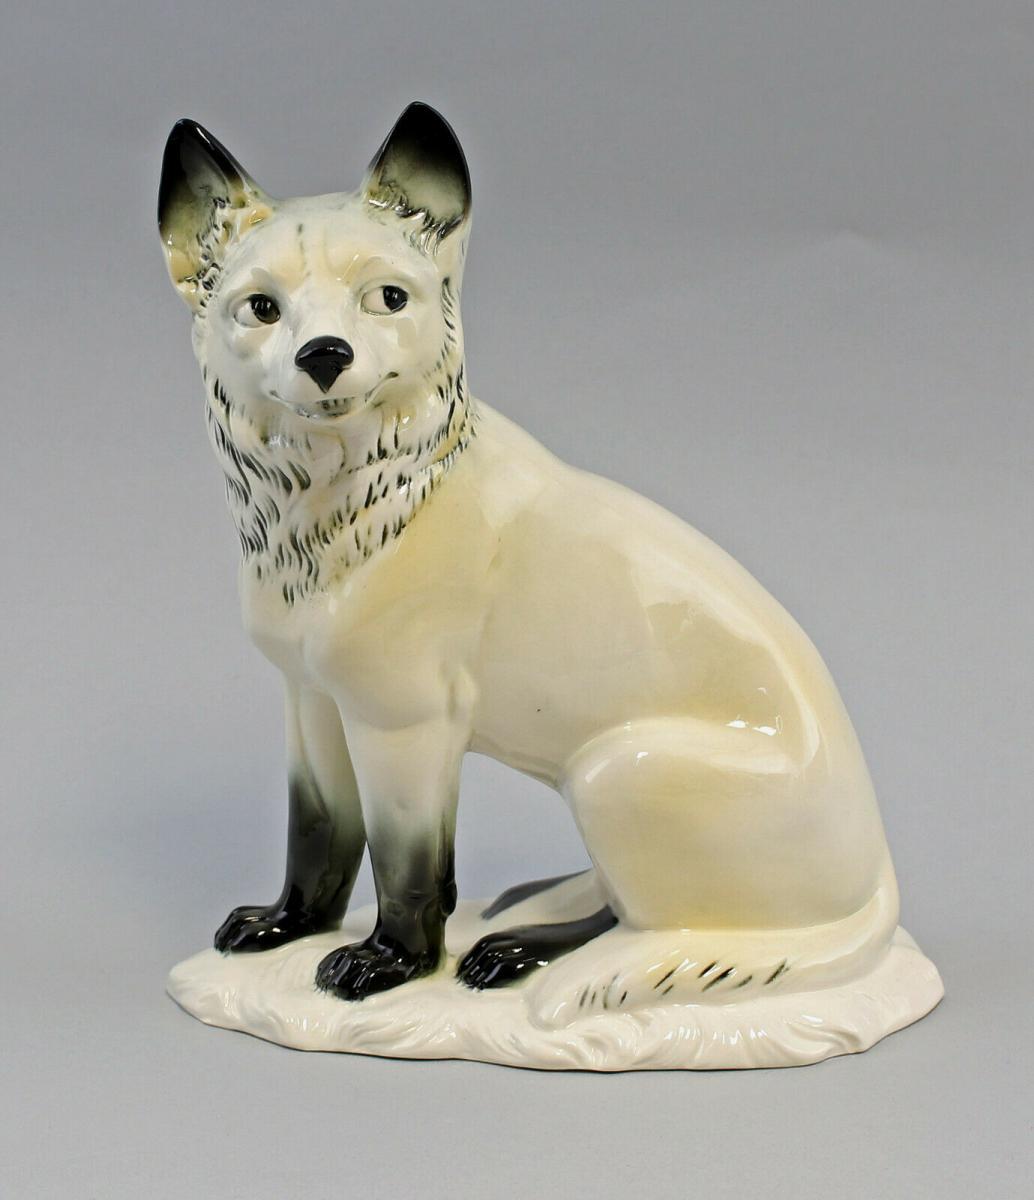 9959478 Porzellan Figur Polar- Fuchs Ens 17,5x9x21,5cm